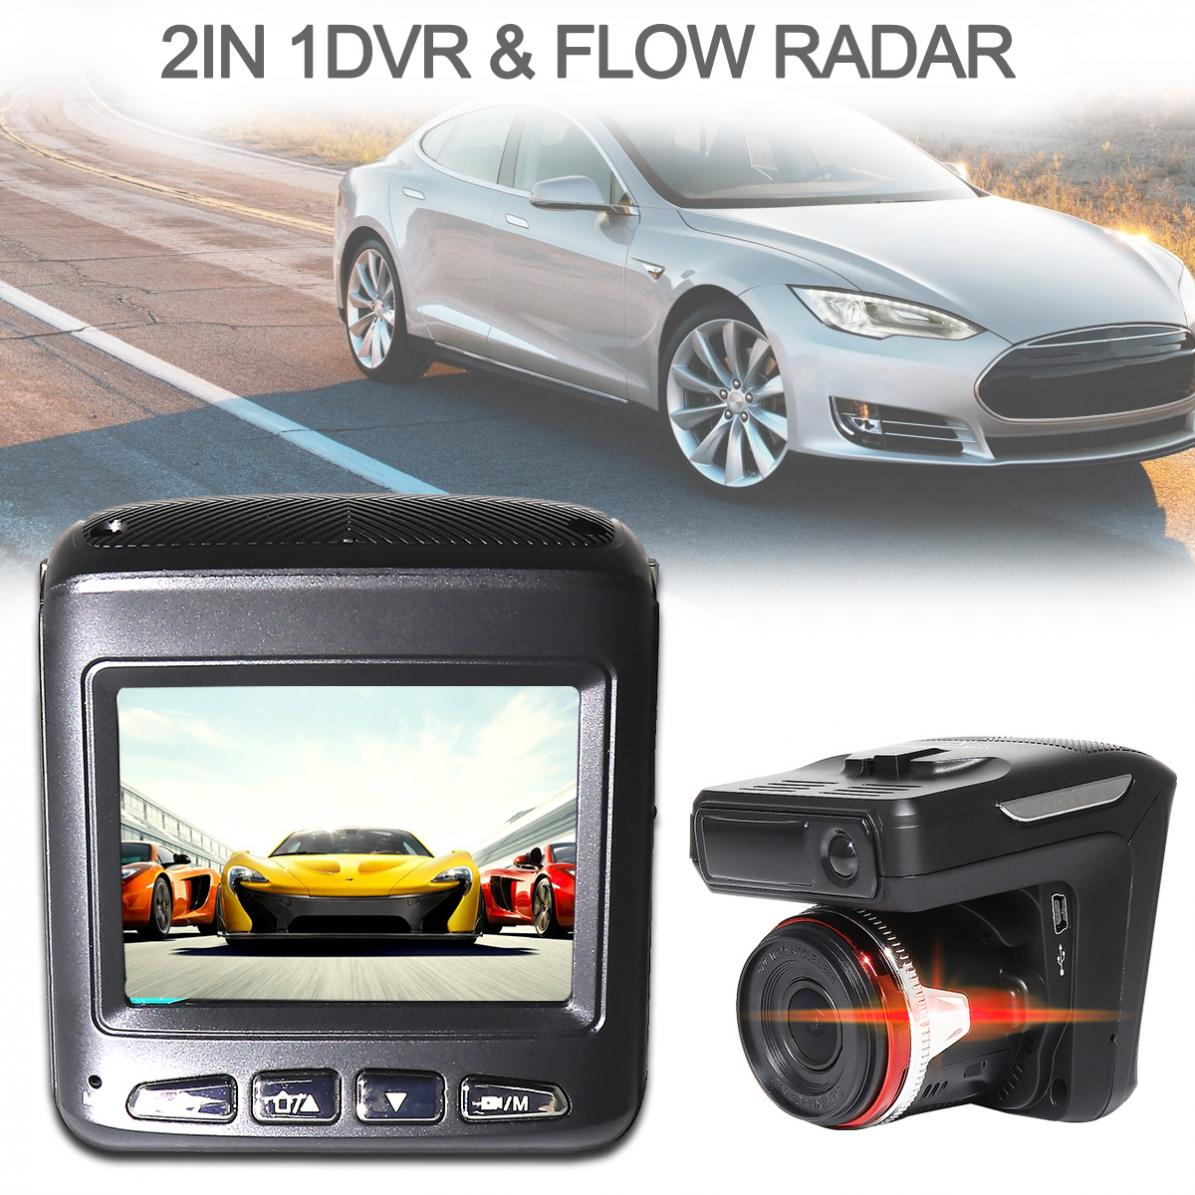 2 In 1 Car DVR Radar Detector G senor Car detector Camera HD 1280P speed camera